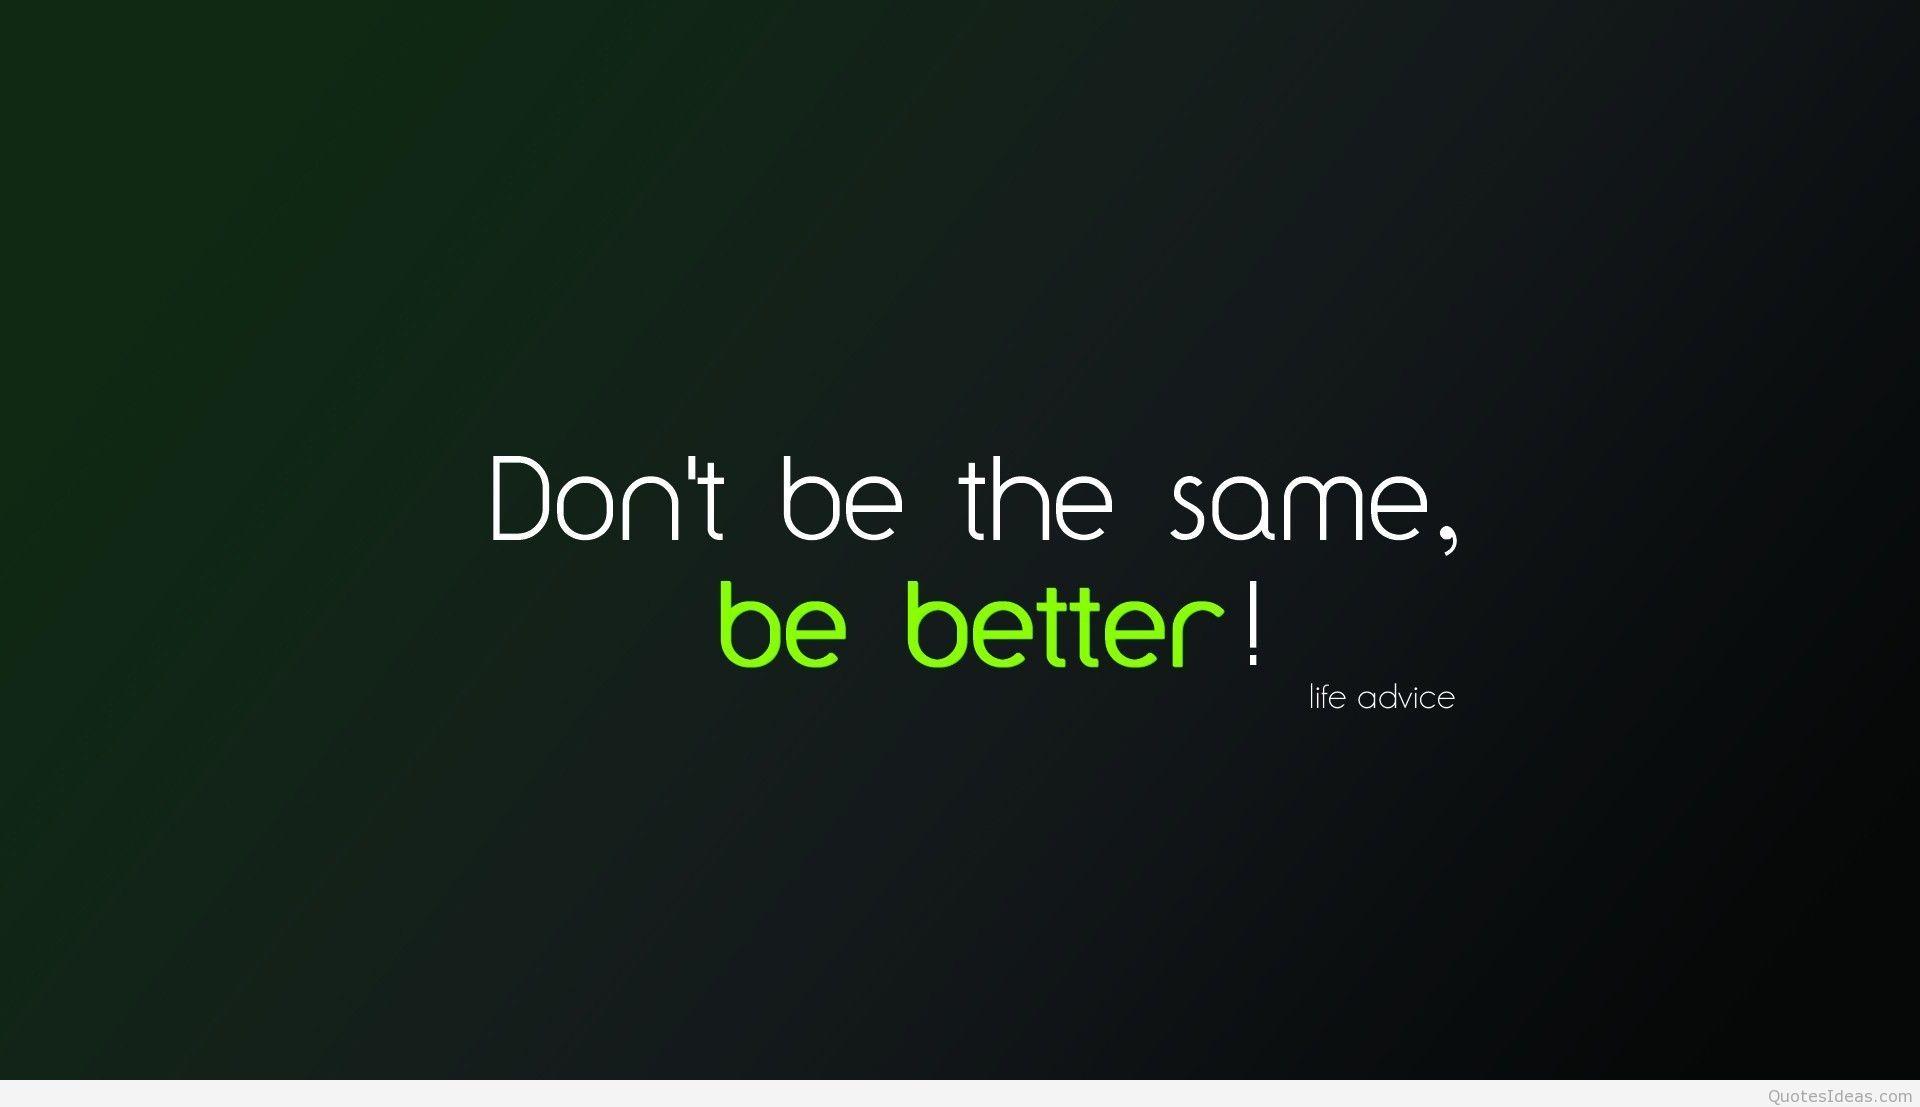 Download Desktop Background Images Quotes Hd Desktop Background Images Quotes Inspirational Quotes Wallpapers African Quotes Motivational Quotes Wallpaper